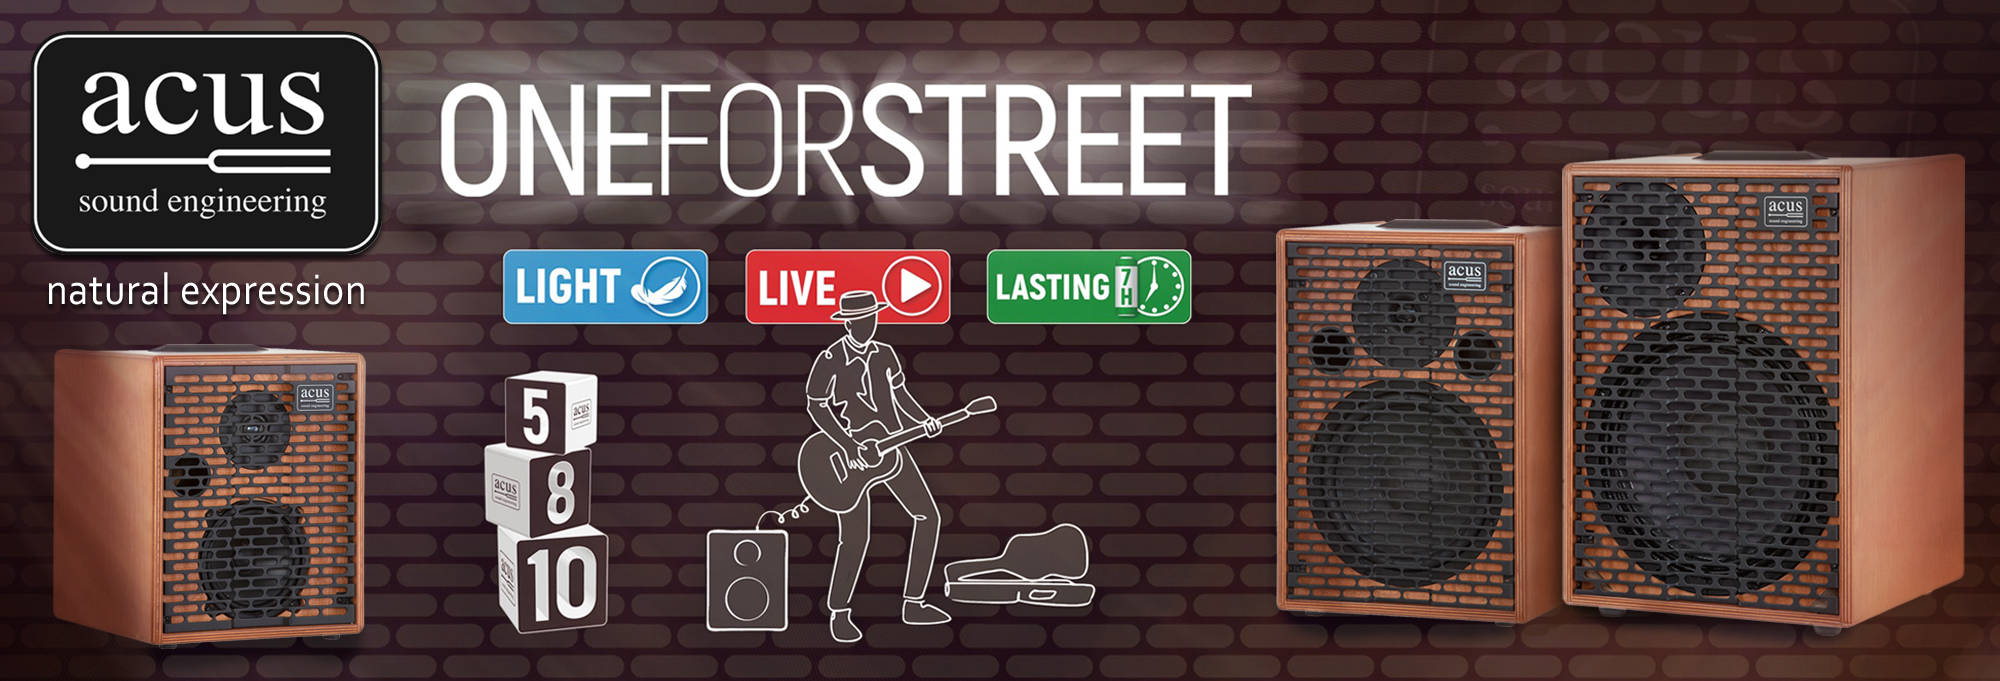 Acts OneForStreet Series